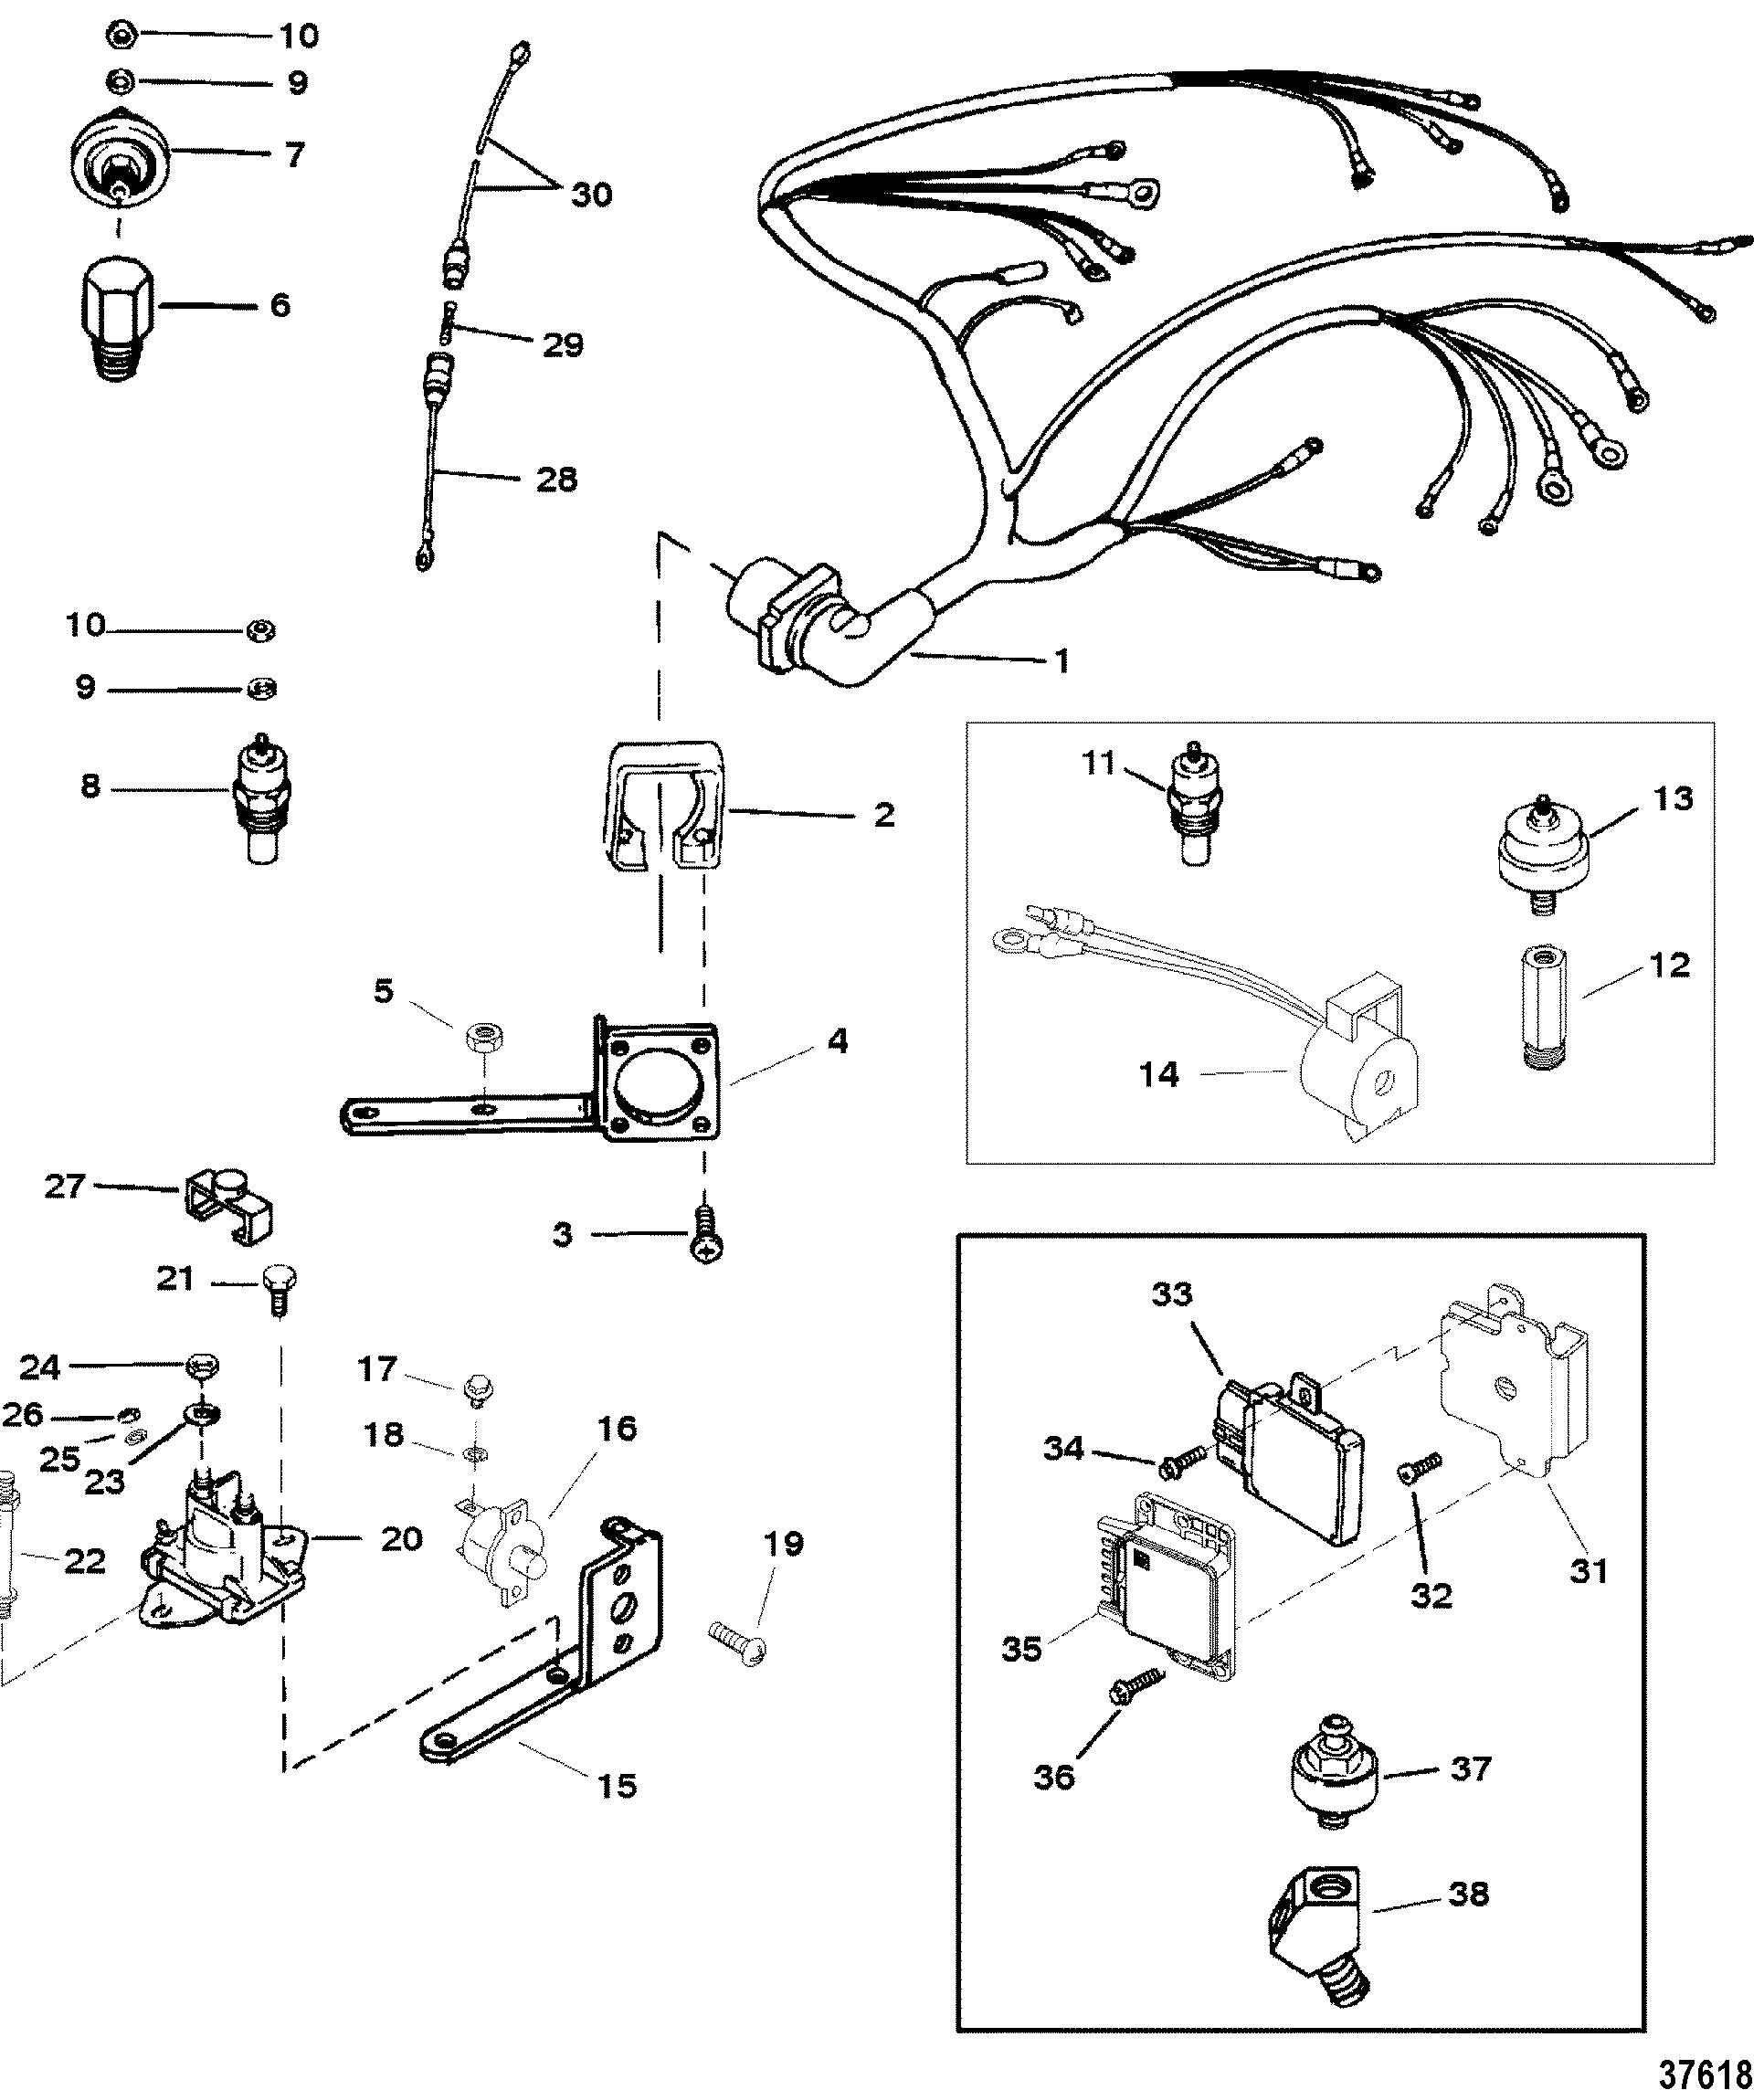 Thunderbolt Iv Ignition Wiring Diagram, Thunderbolt, Get